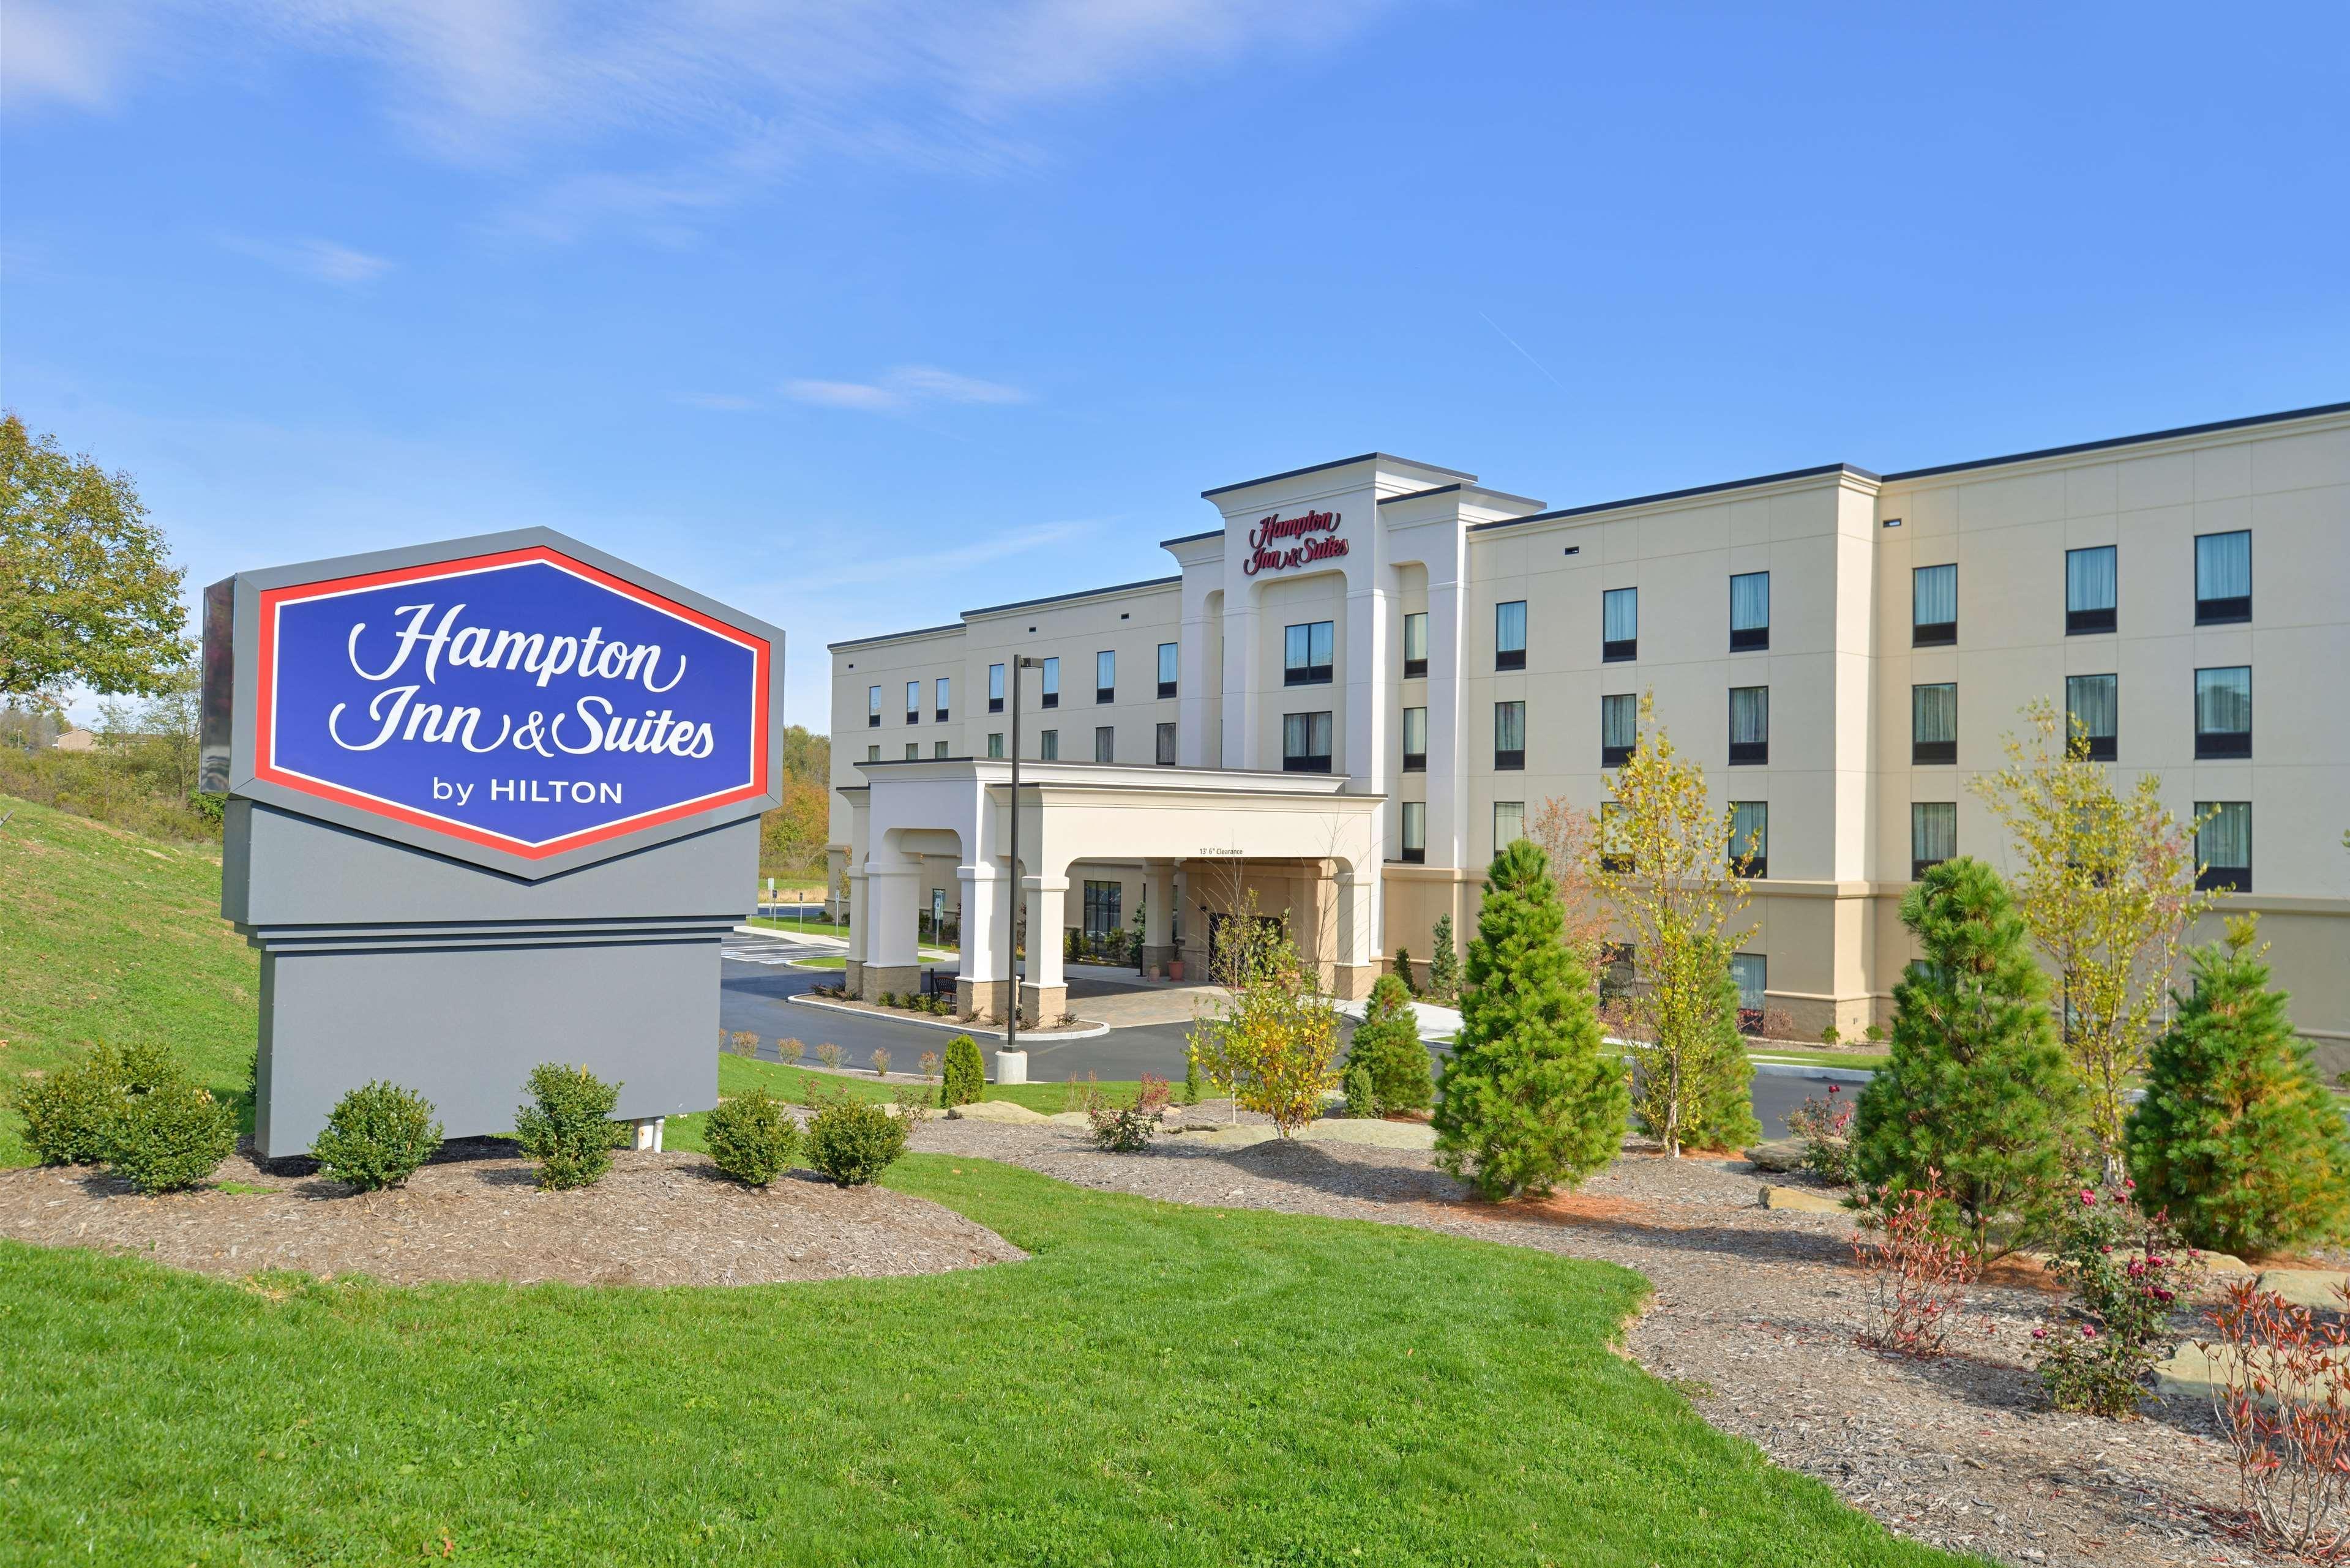 Hampton Inn & Suites California University, Washington